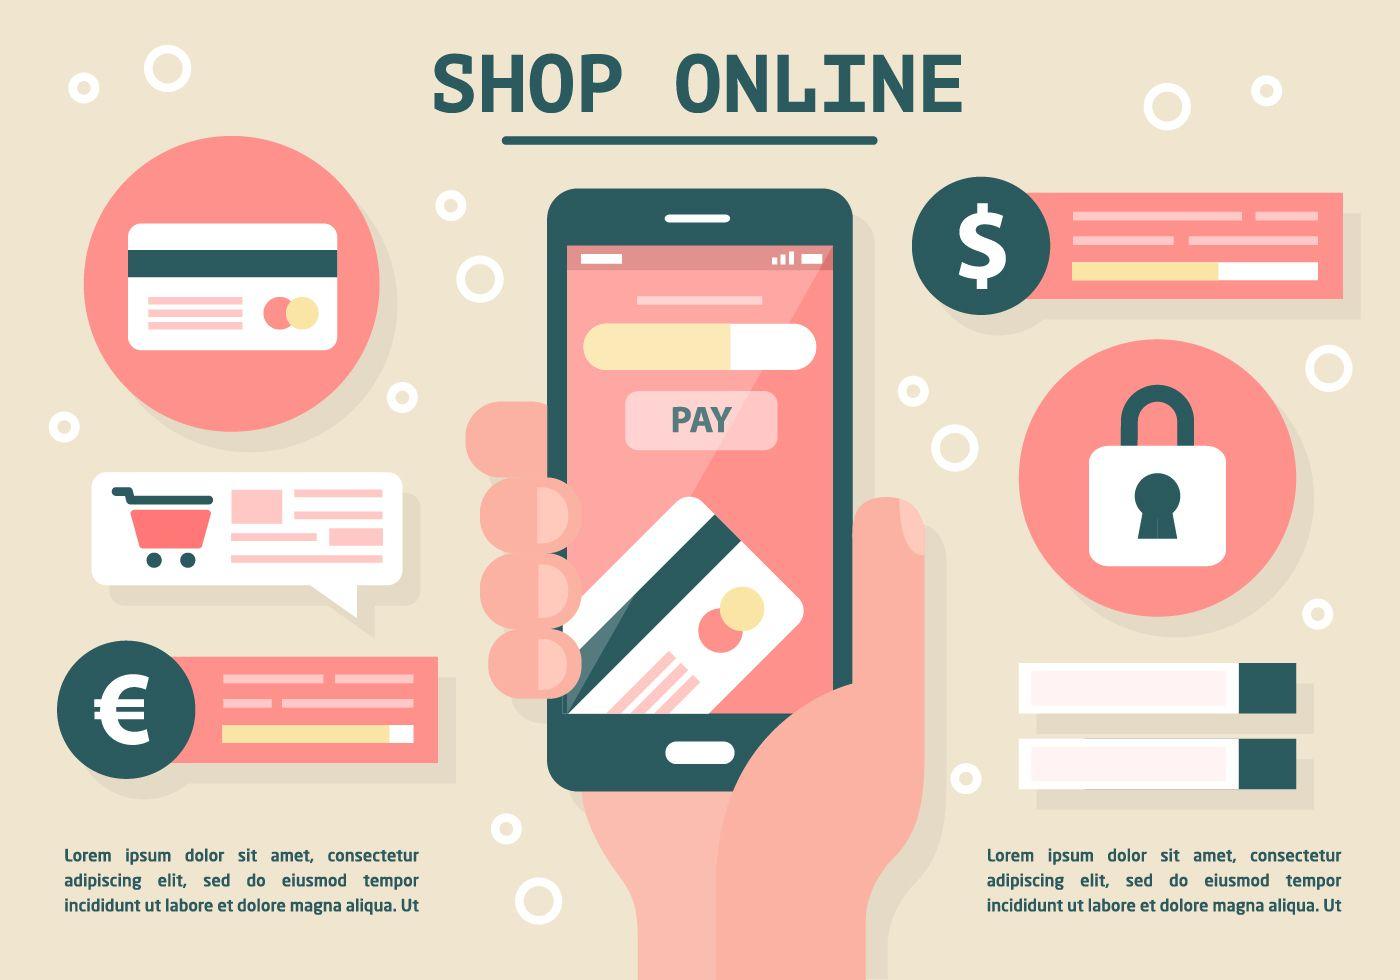 free flat digital marketing vector illustration digital marketing vector illustration illustration free flat digital marketing vector